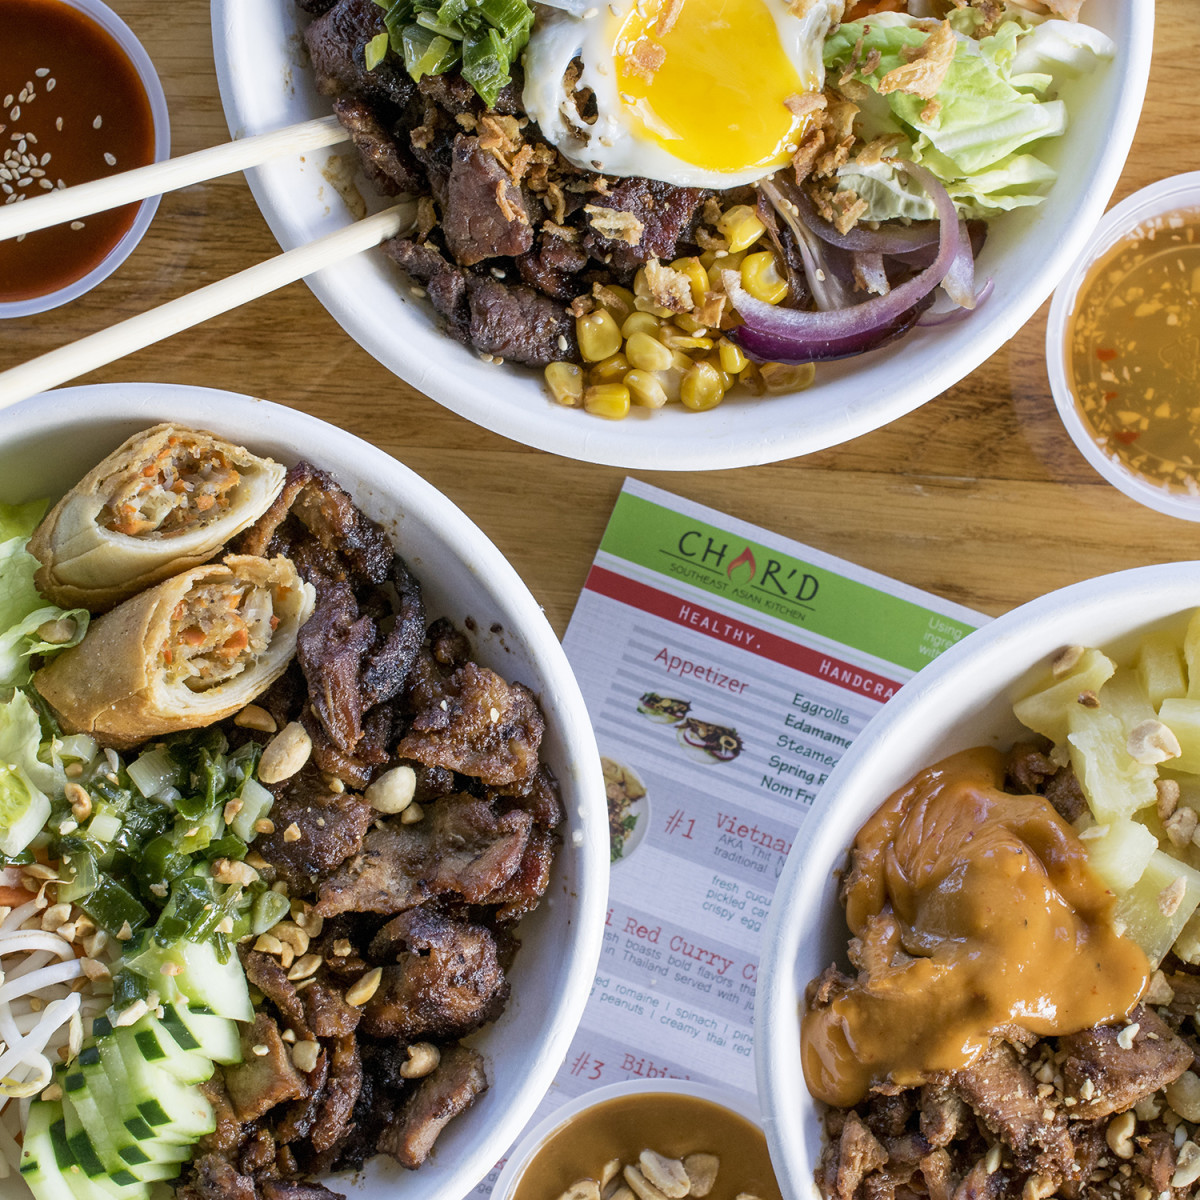 Char'd Southeast Asian Kitchen